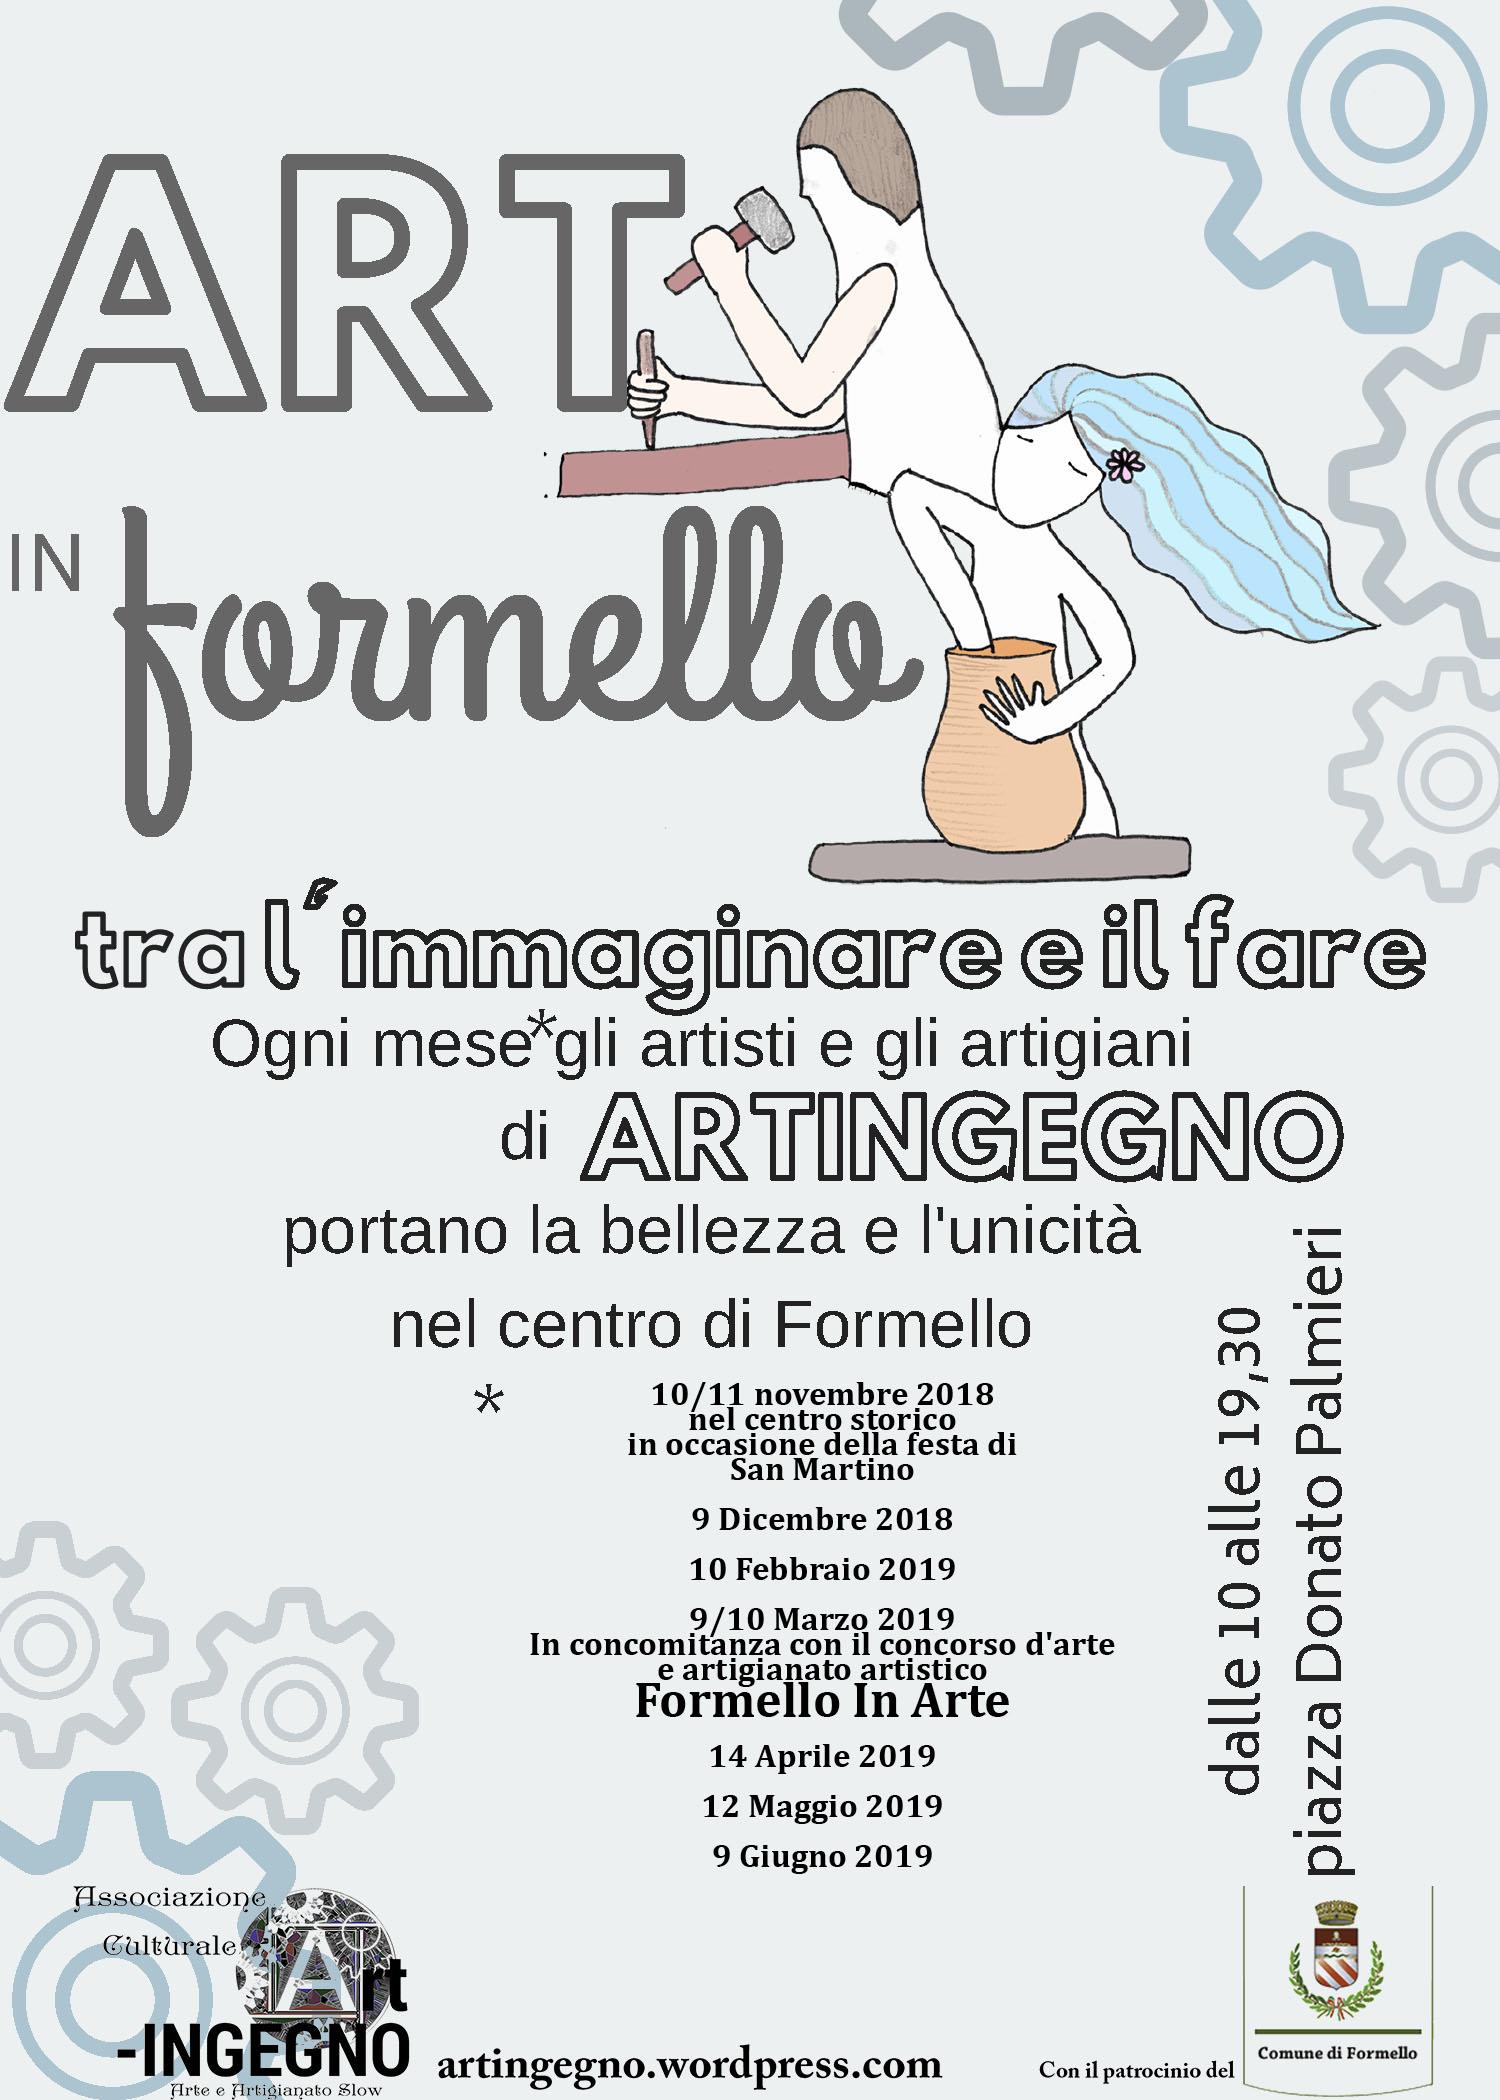 art'informello artigianato artistico a formello